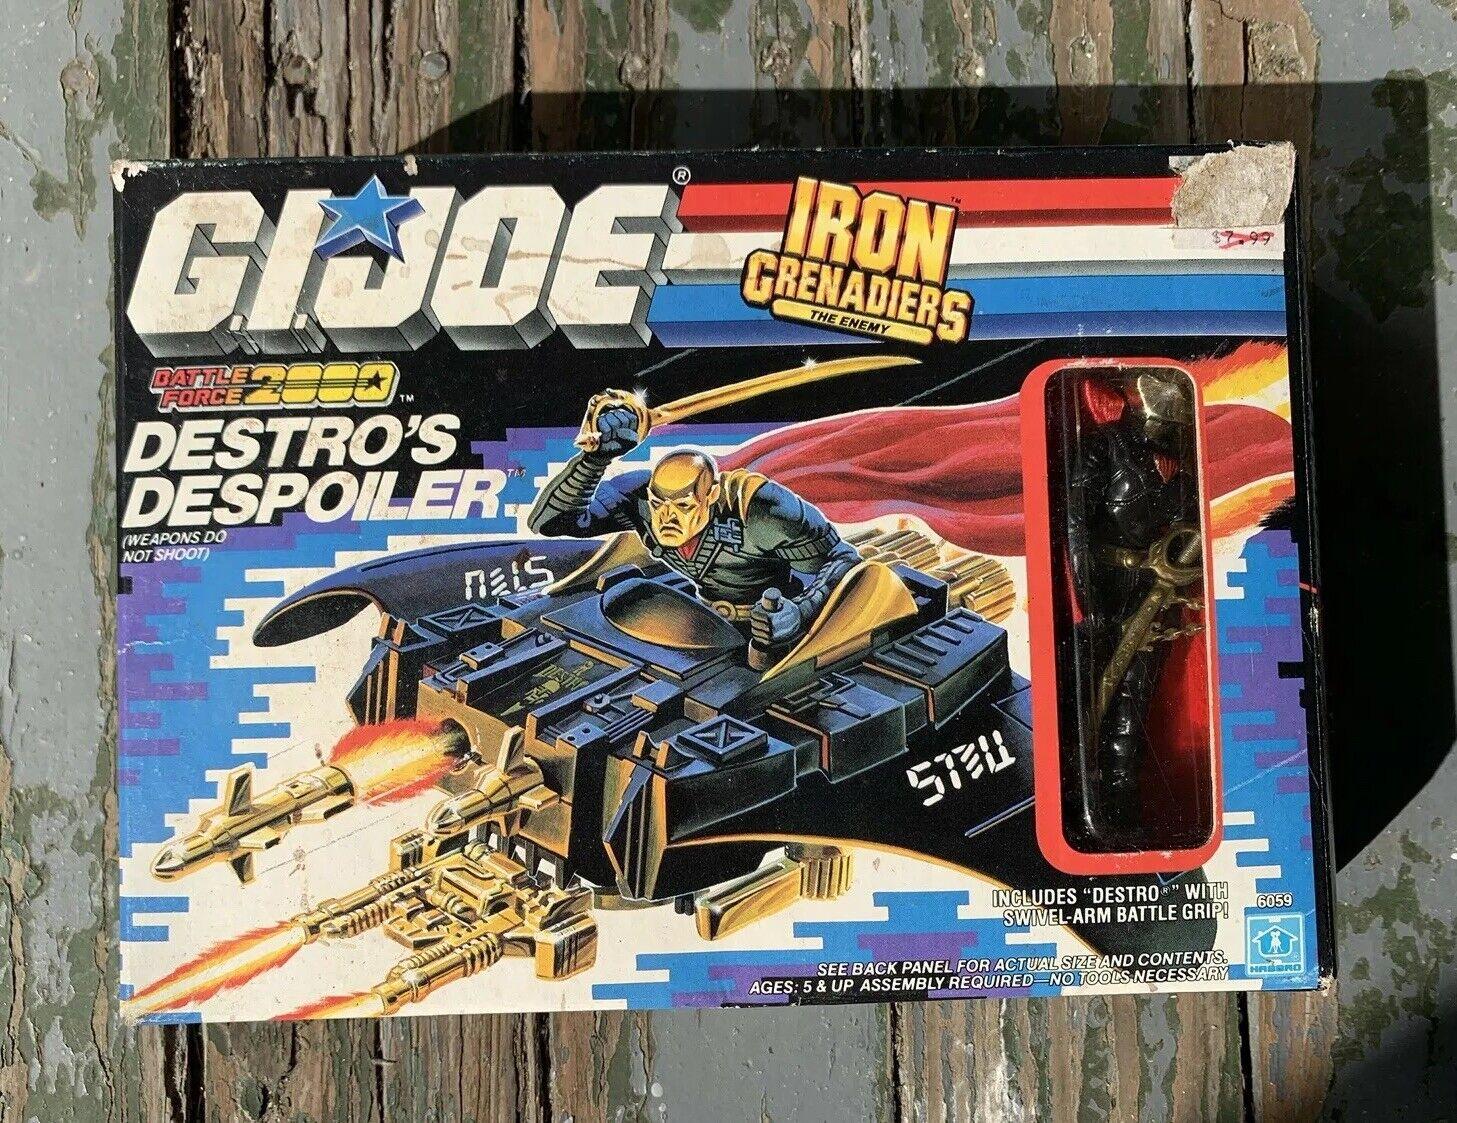 Vintage GI JOE Destros Despoiler Action Figure Toy Hasbro 6059 New In Box